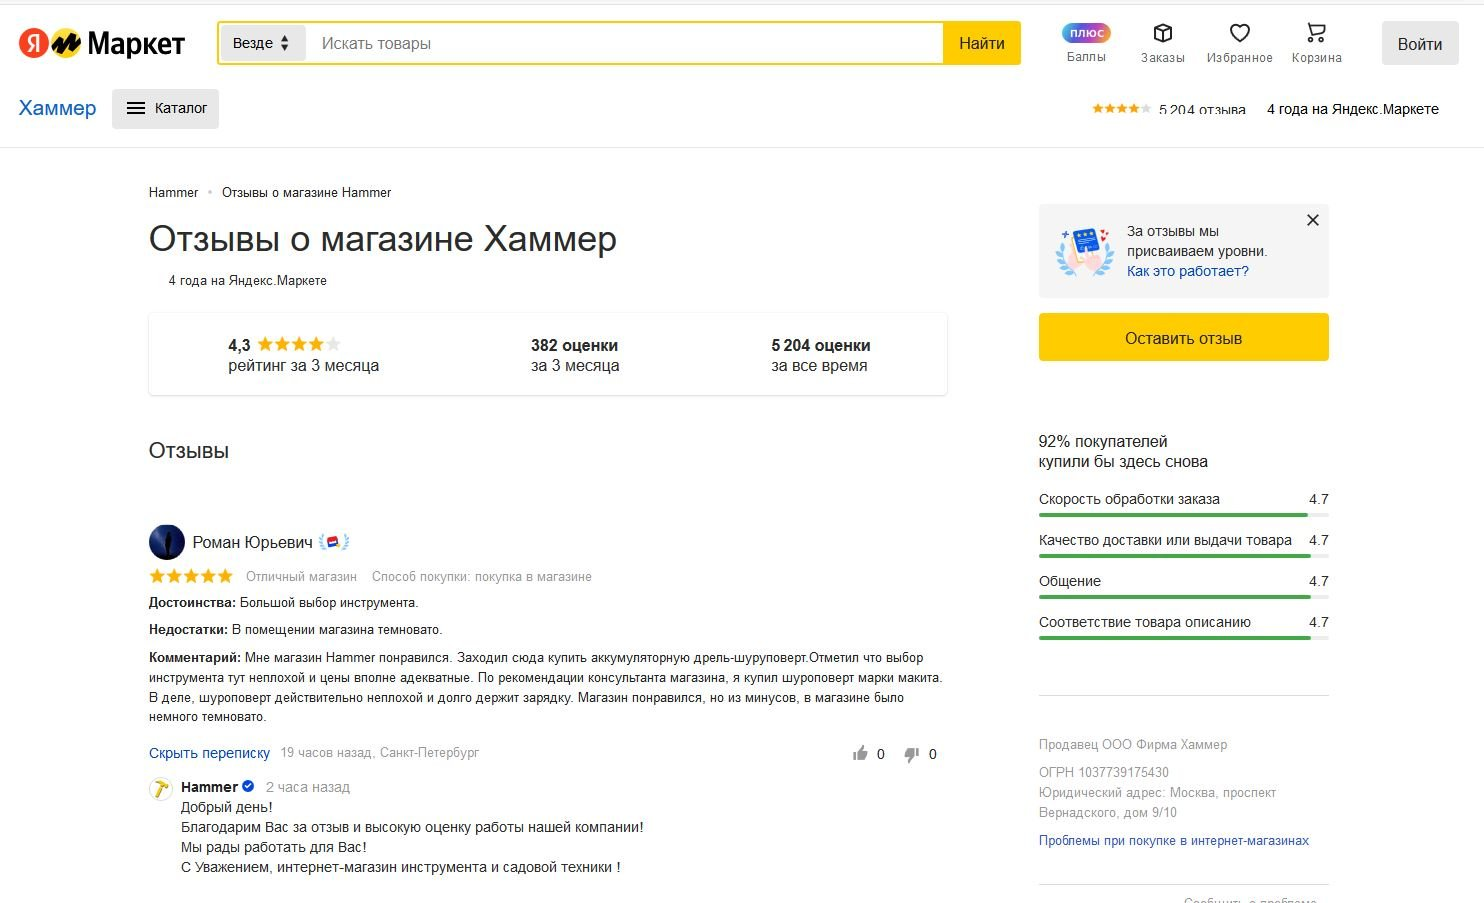 Фейковый яндекс маркет market.yandex.pp.ru